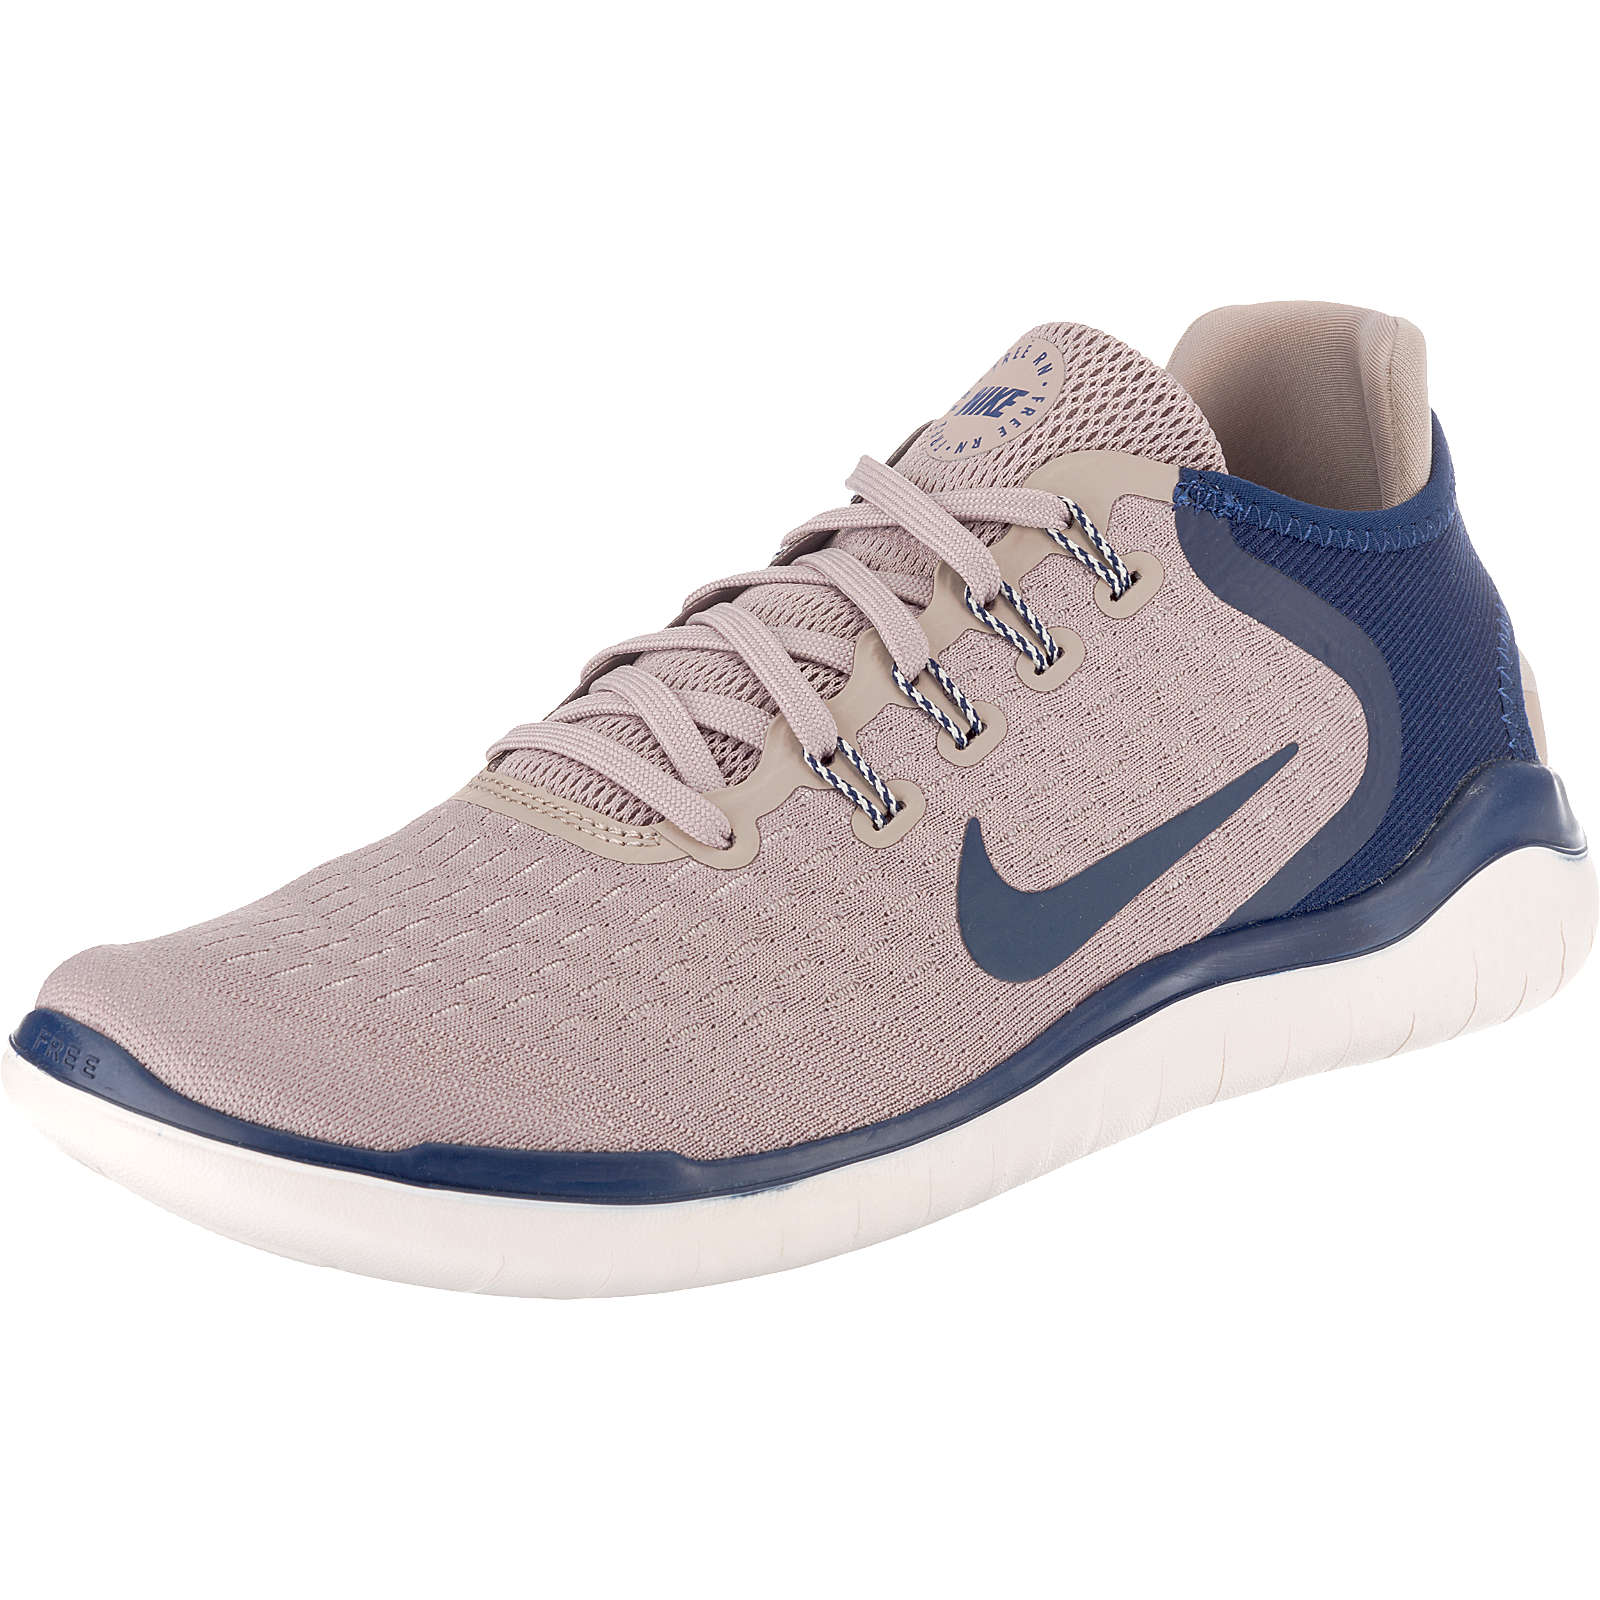 Nike Performance Free Rn 2018 Laufschuhe blau Herren Gr. 40,5